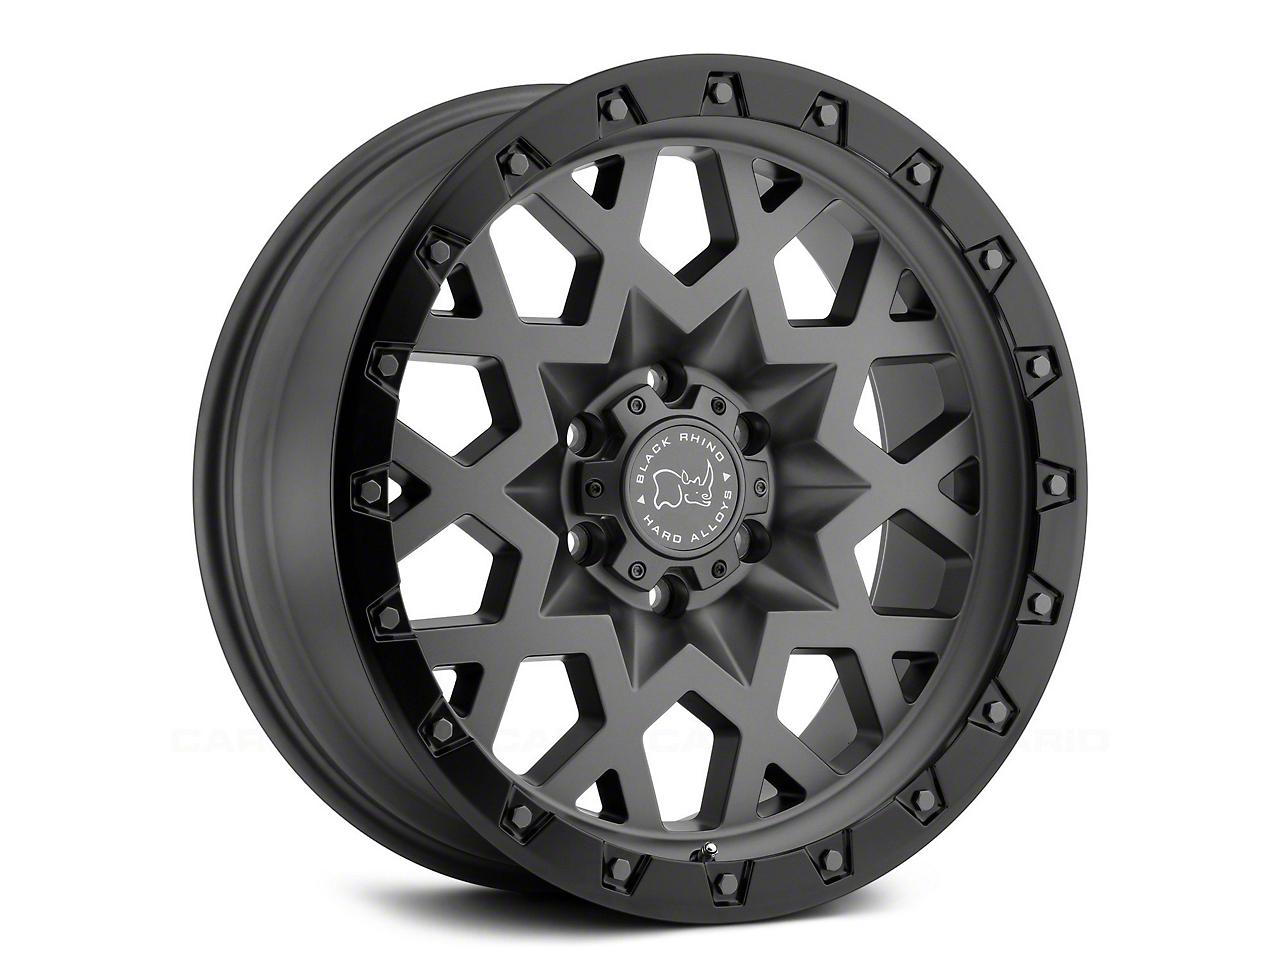 Black Rhino Sprocket Matte Gunmetal 6-Lug Wheel - 17x9.5 (99-18 Silverado 1500)